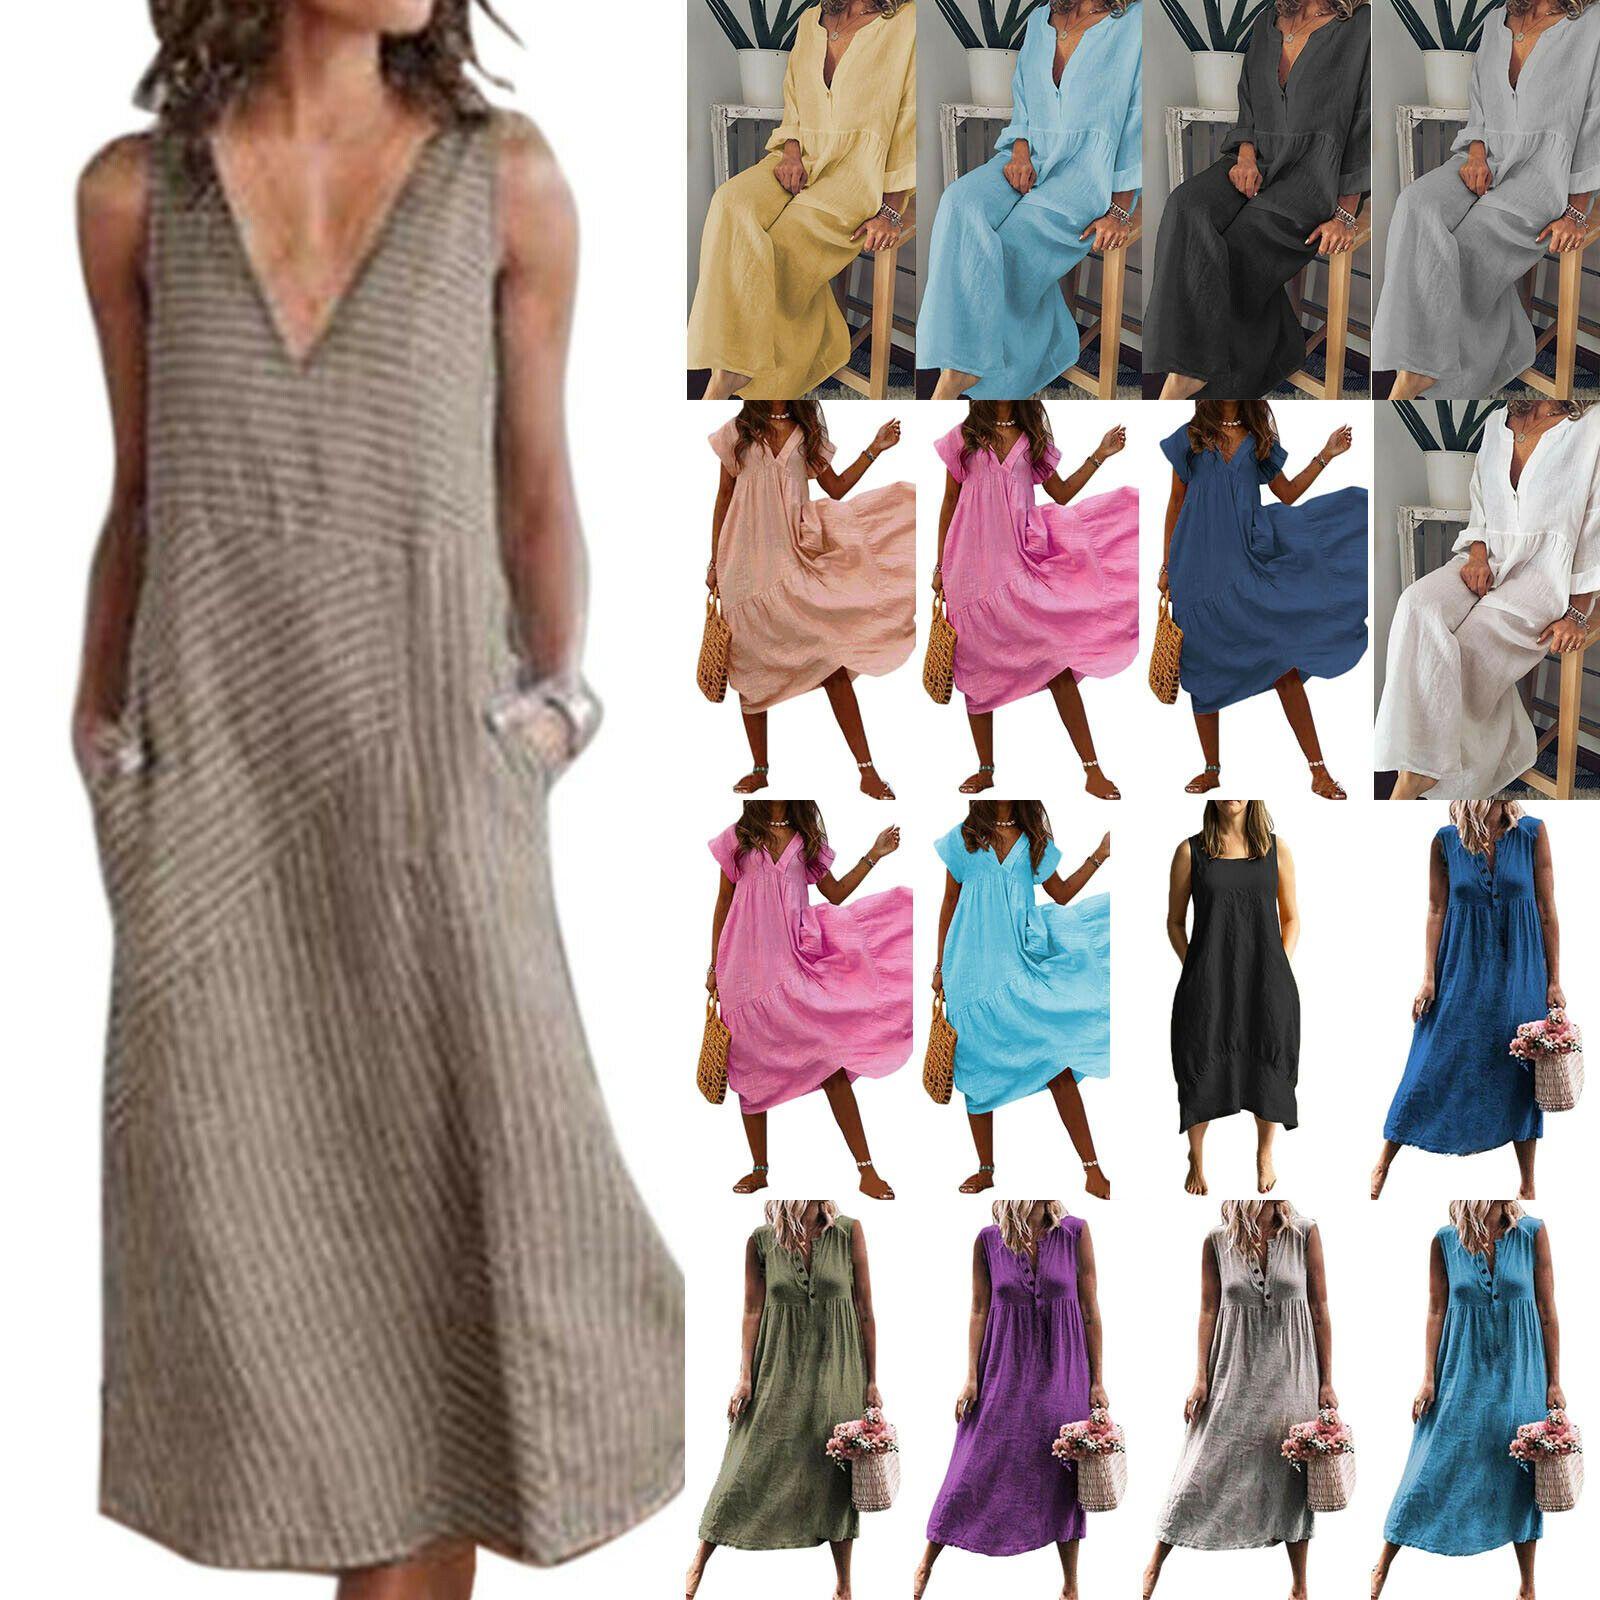 Damen Lose Langarm Kleid Shirtkleid Winter Longshirt Tunika Übergröße Sweater DE